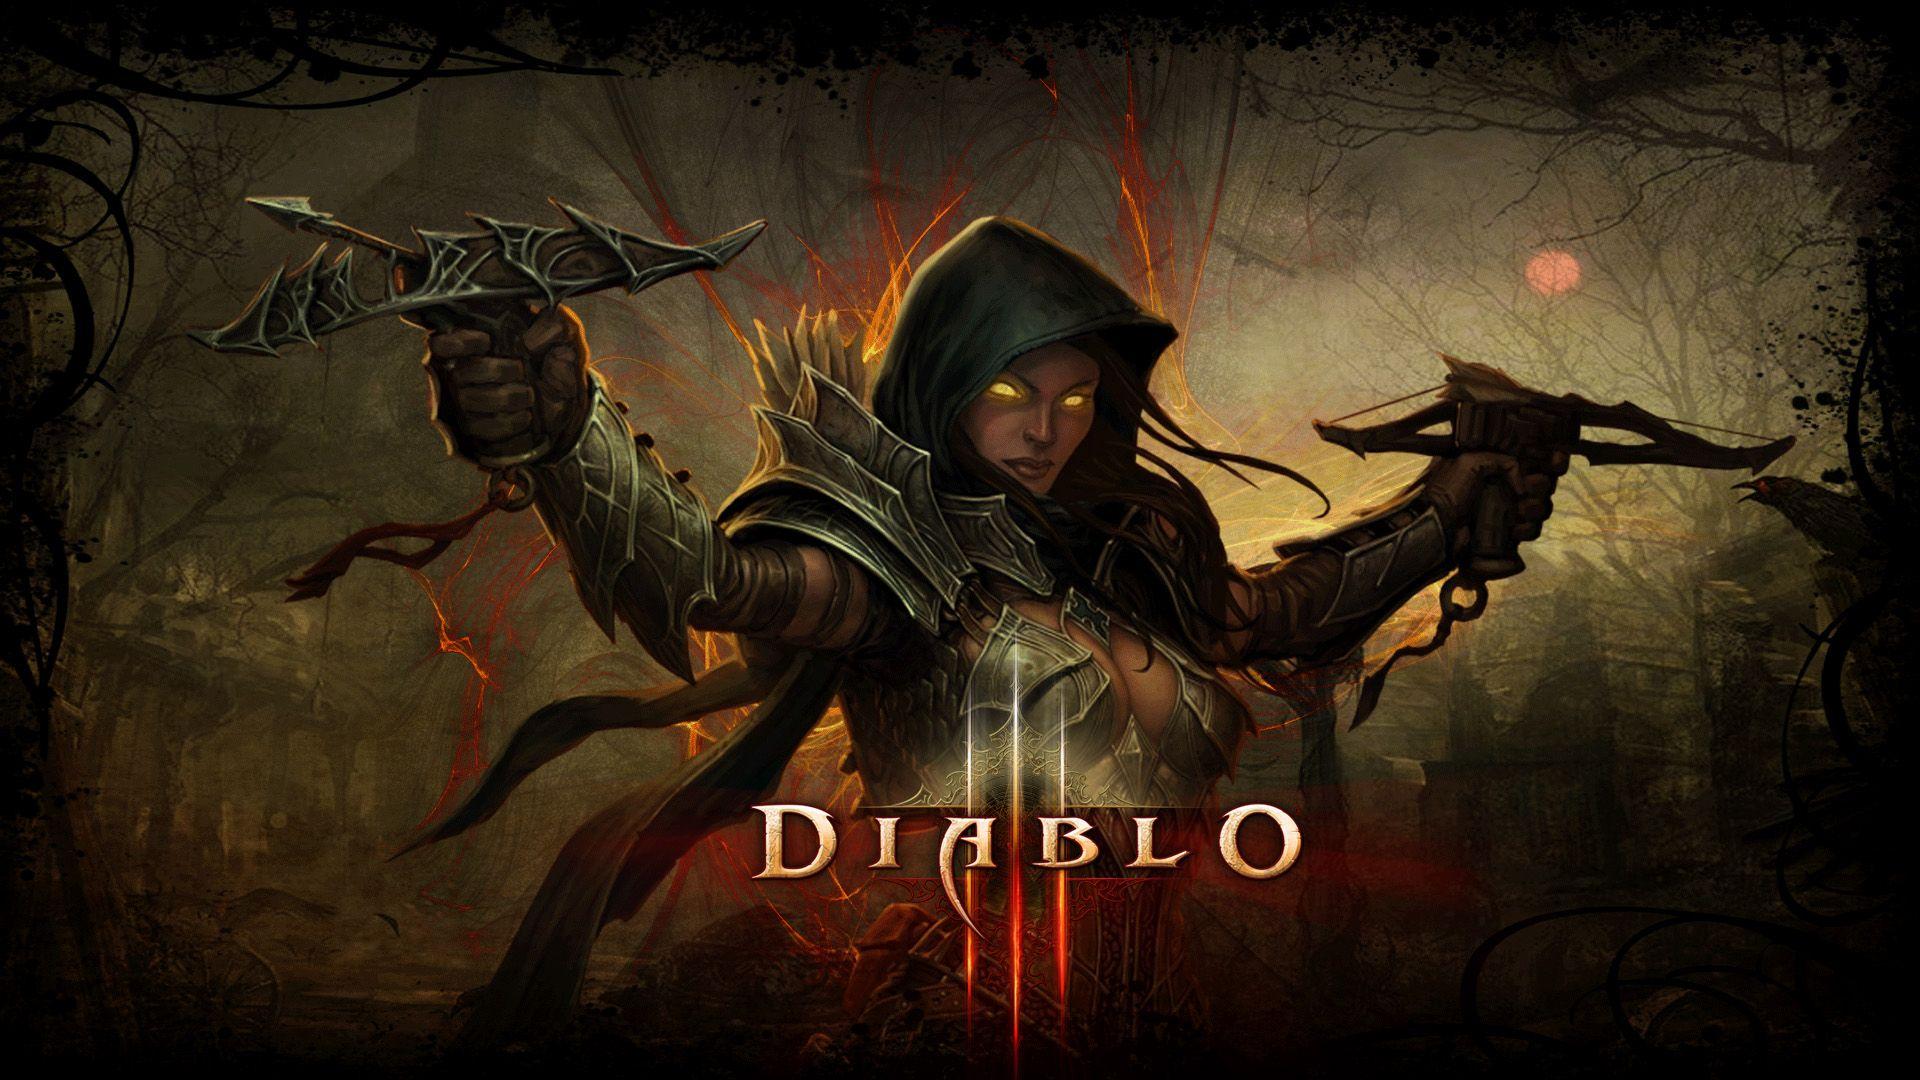 Diablo Iii Reaper Of Souls Demon Hunter Wallpaper Demon Hunter